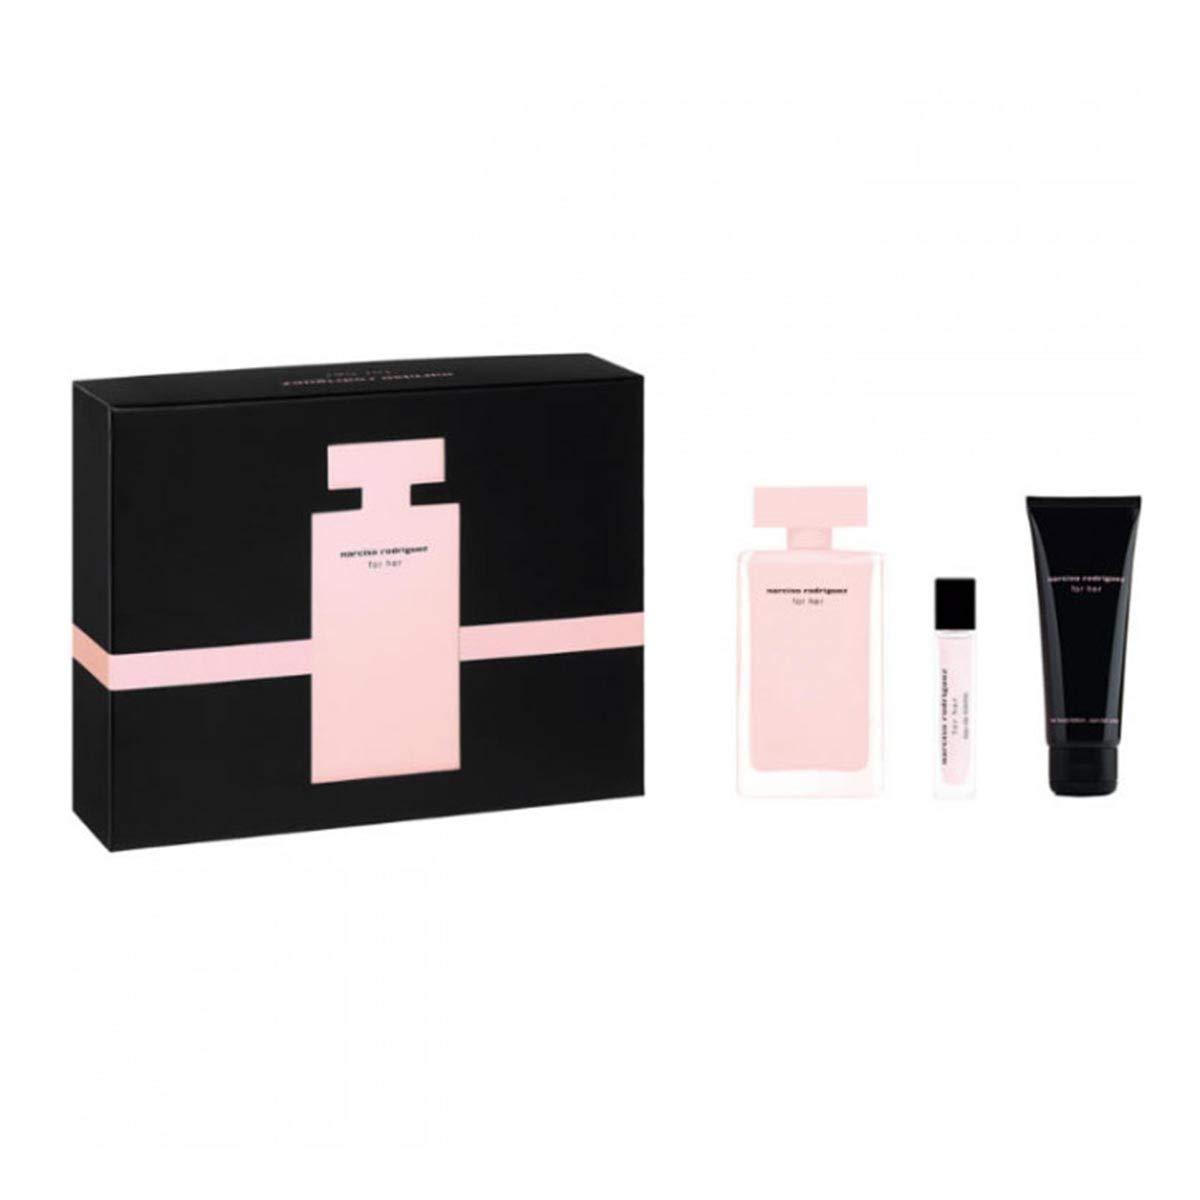 Narciso Rodriguez 3pcs Set Women Eau de Parfum Spray 3.3Fl Oz+Purse Spray 0.33 Fl Oz+Body Lotion 2.5 Fl Oz